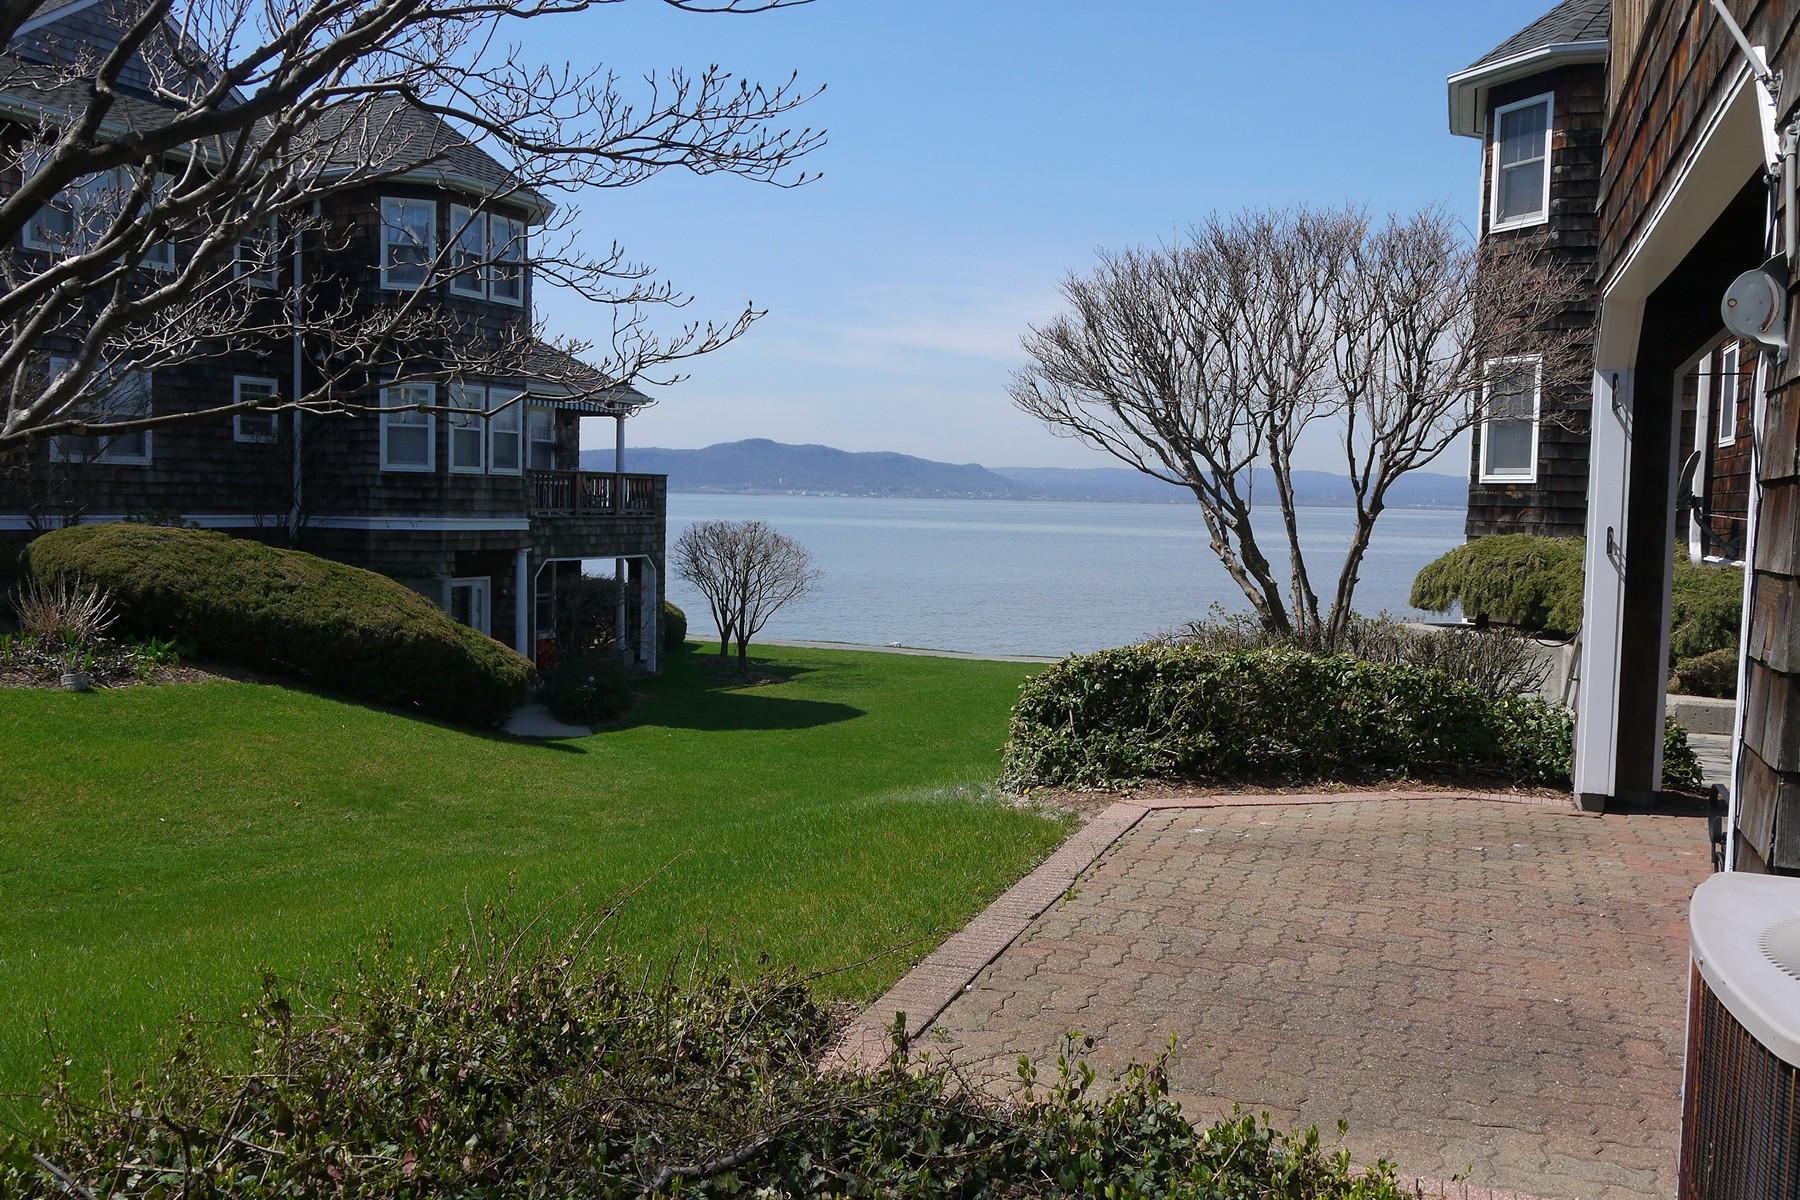 Condominium for Rent at Half Moon Bay Rental 515 Half Moon Bay Drive Croton On Hudson, New York 10520 United States